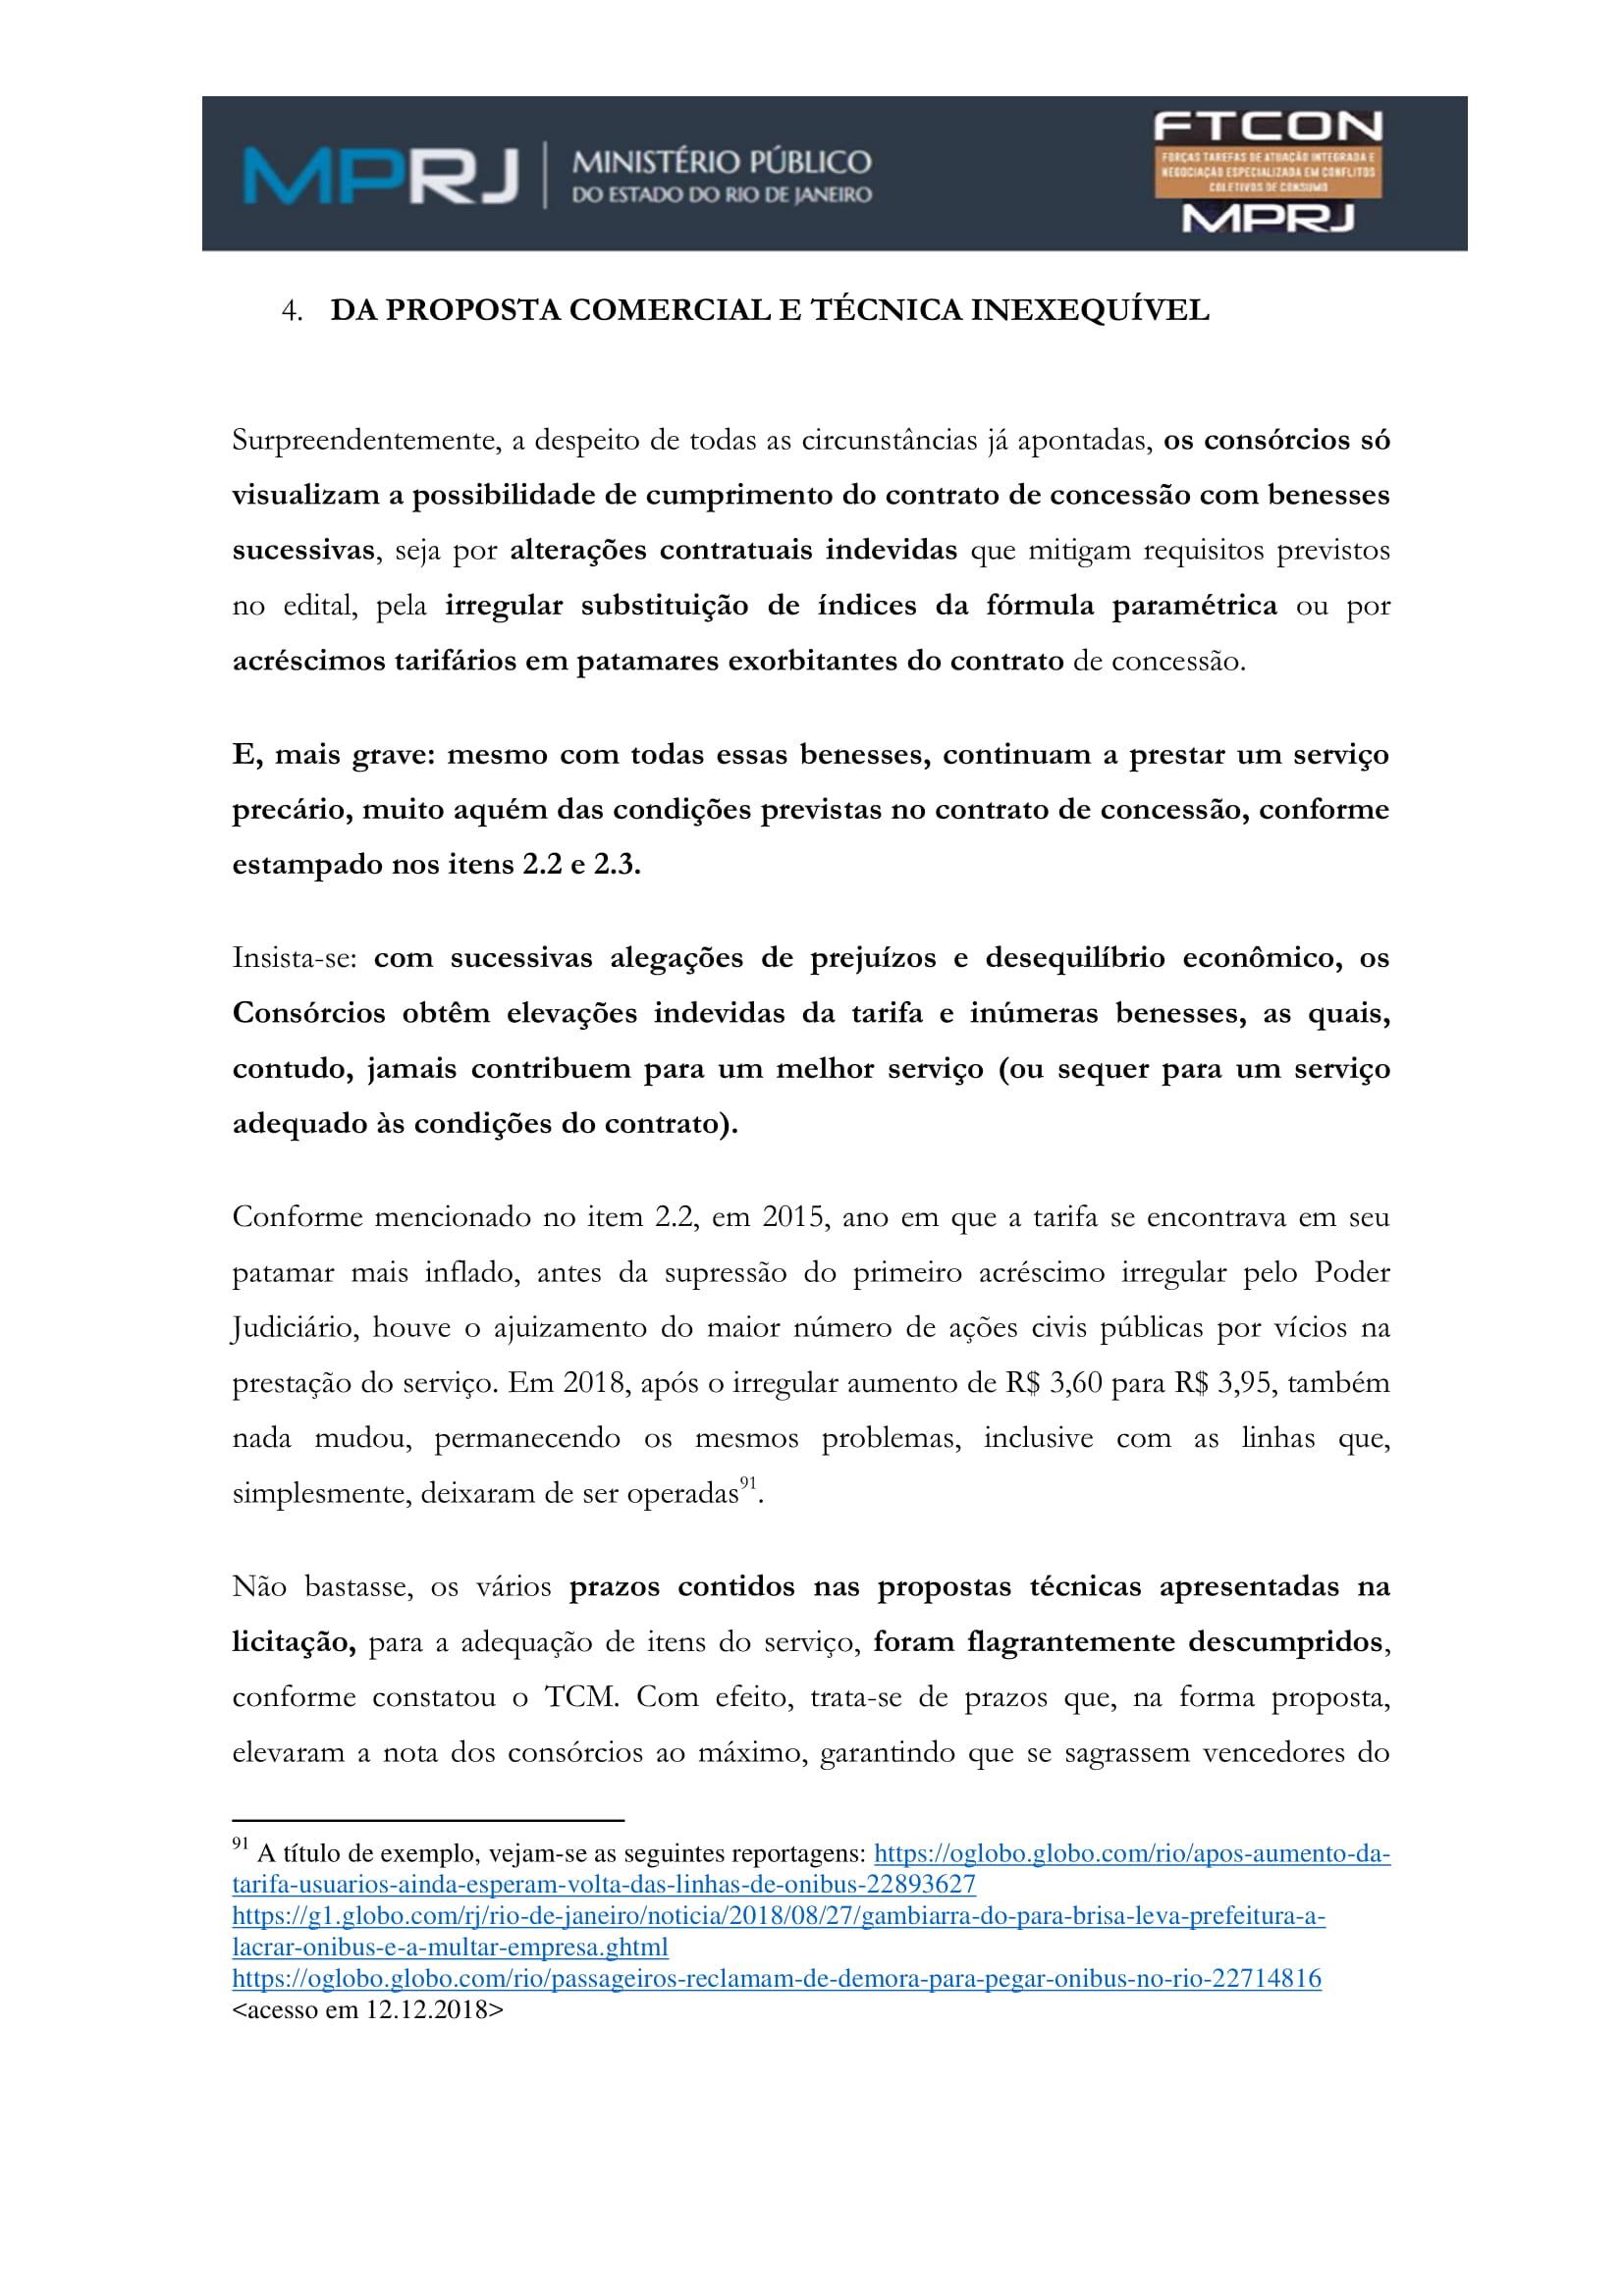 acp_caducidade_onibus_dr_rt-100